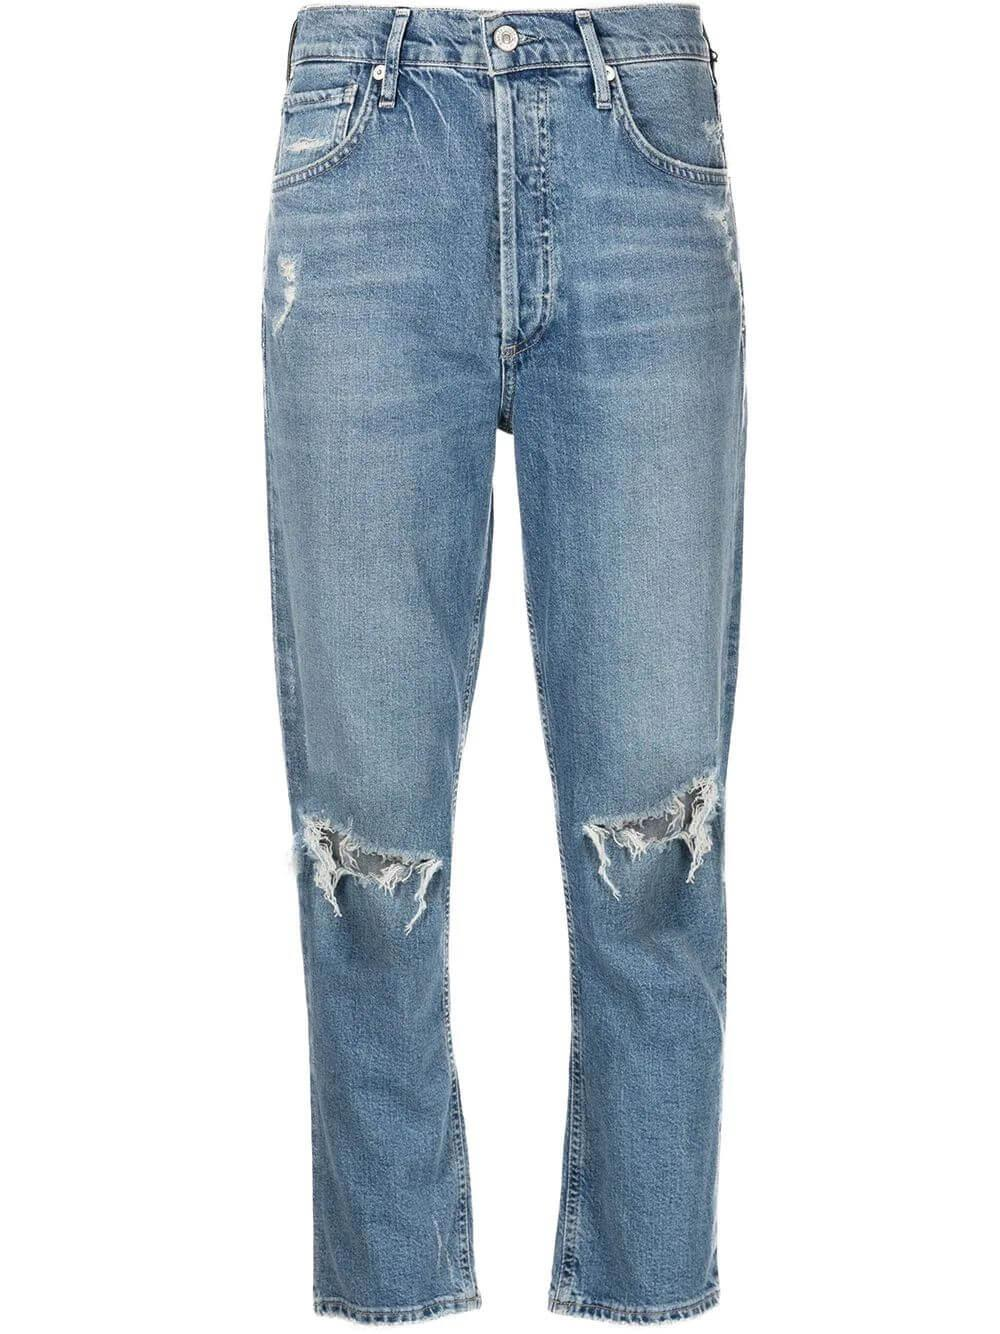 Charlotte Cropped Straight Leg Jeans Item # 1762-1281